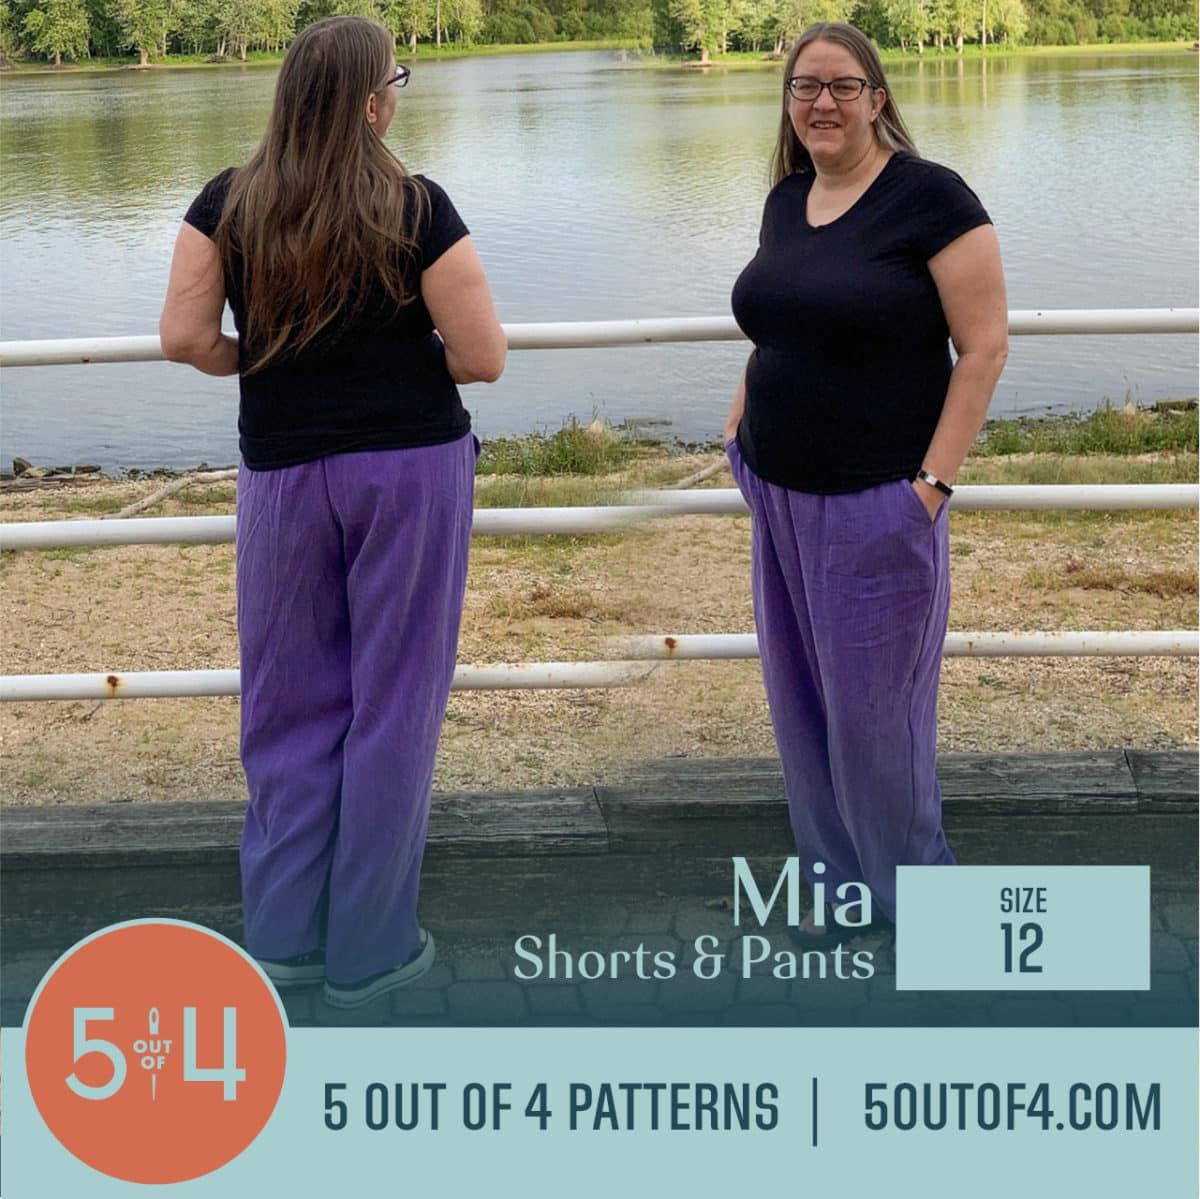 5oo4 Patterns Mia Pants size 12